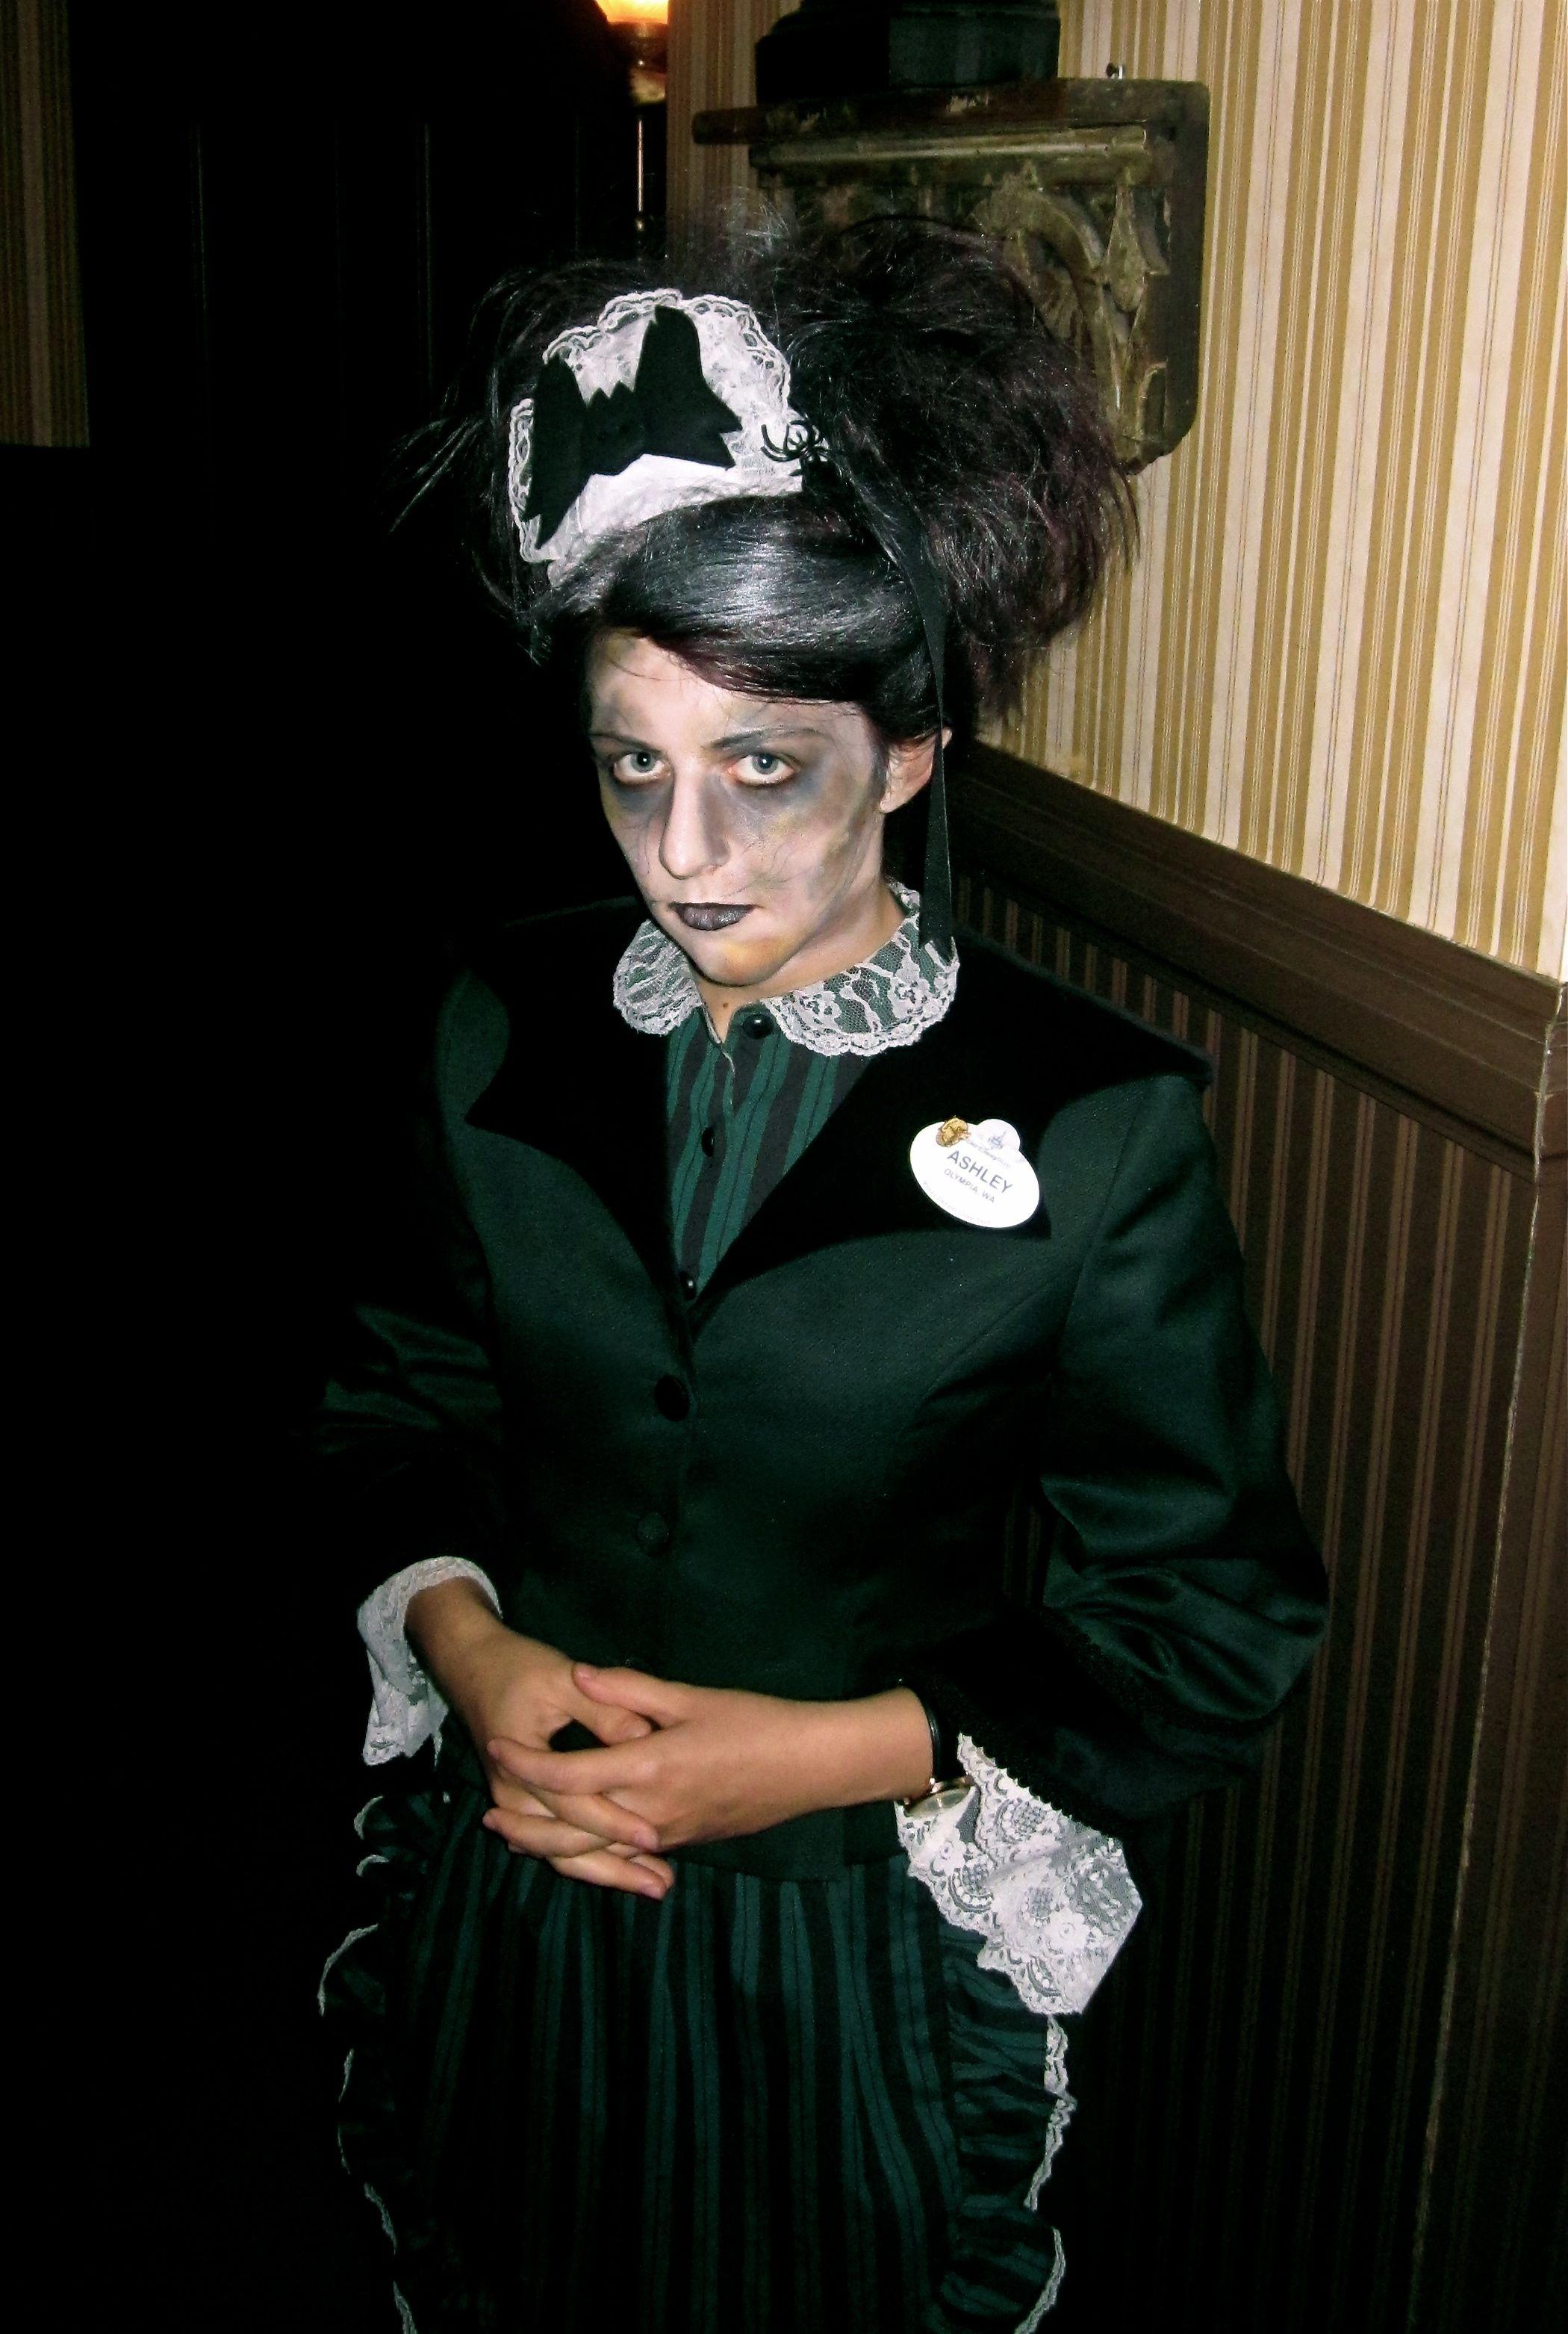 Haunted Mansion Maid Me NotSoScary Halloween Party